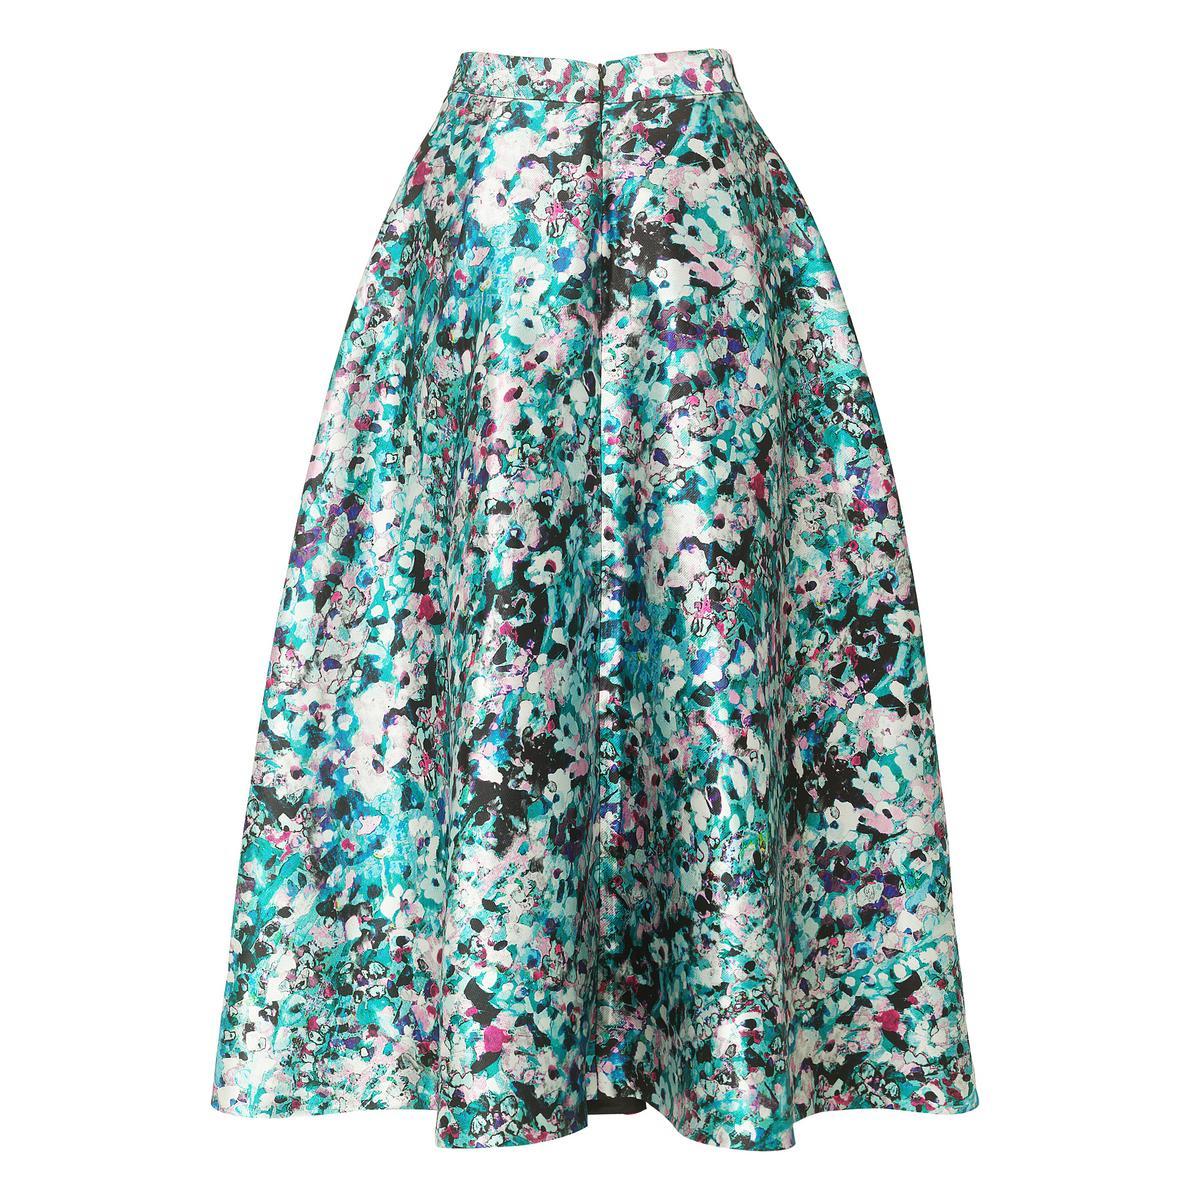 Susan floral print full skirt